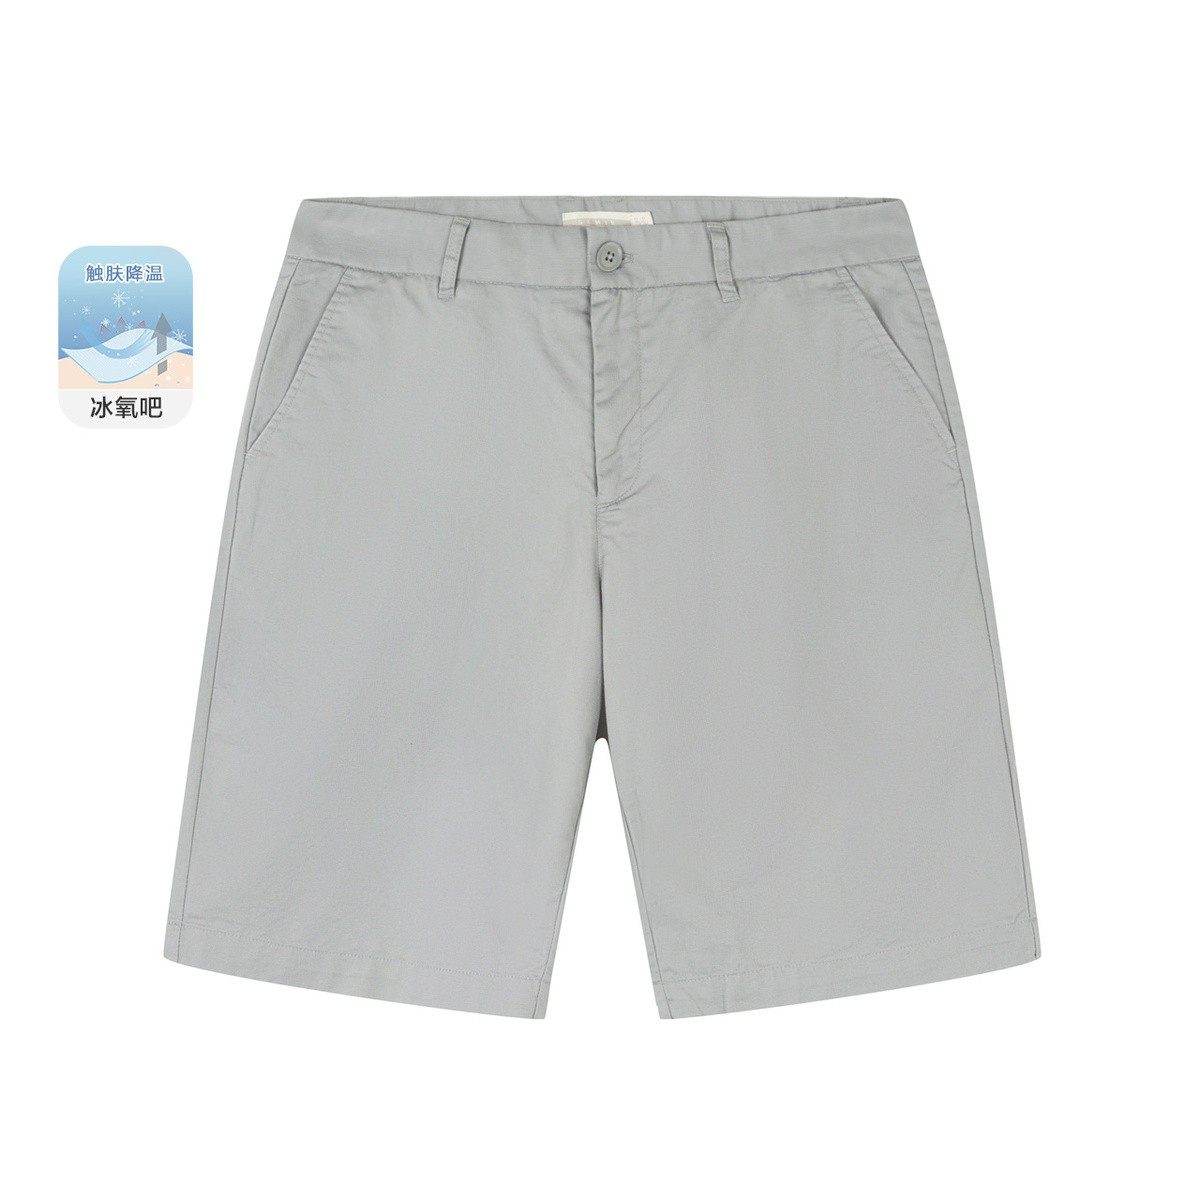 Semir 森马 13B040261239-2004 男士五分短裤